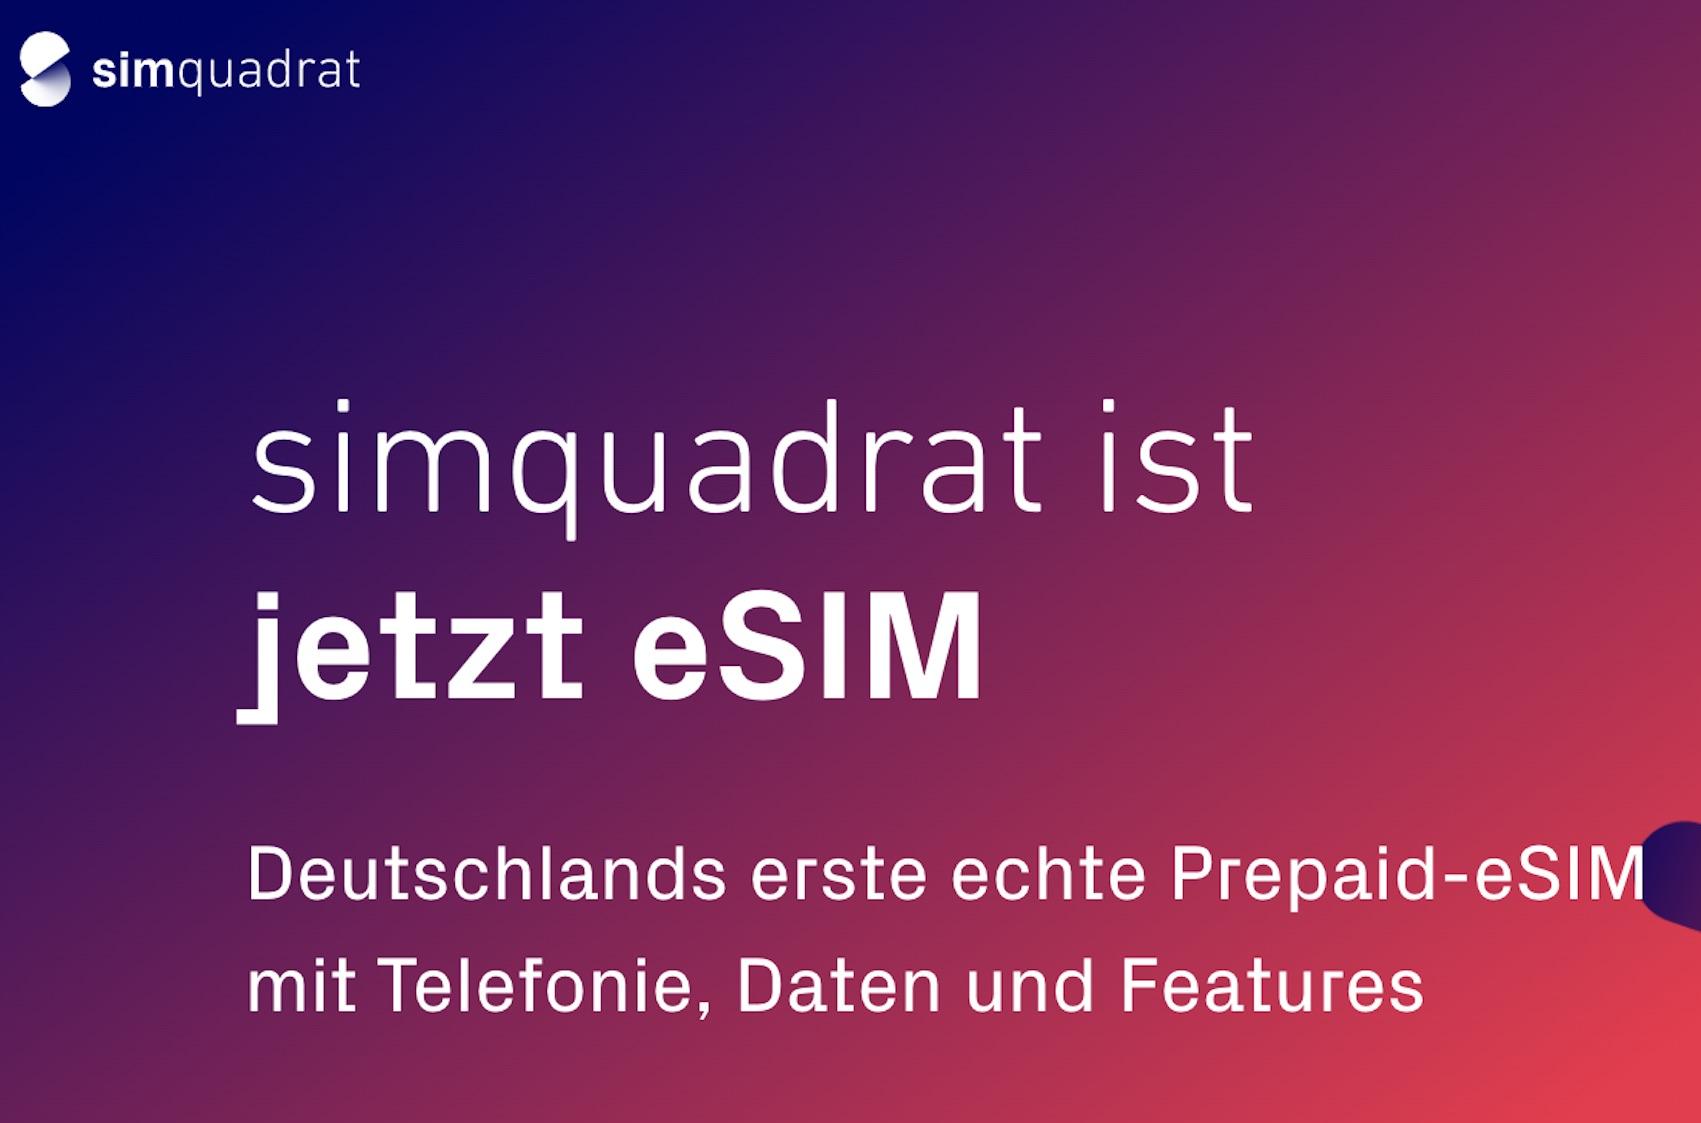 Probleme mit simquadrat (Quelle: simquadrat.de, Screenshot: SmartPhoneFan.de)